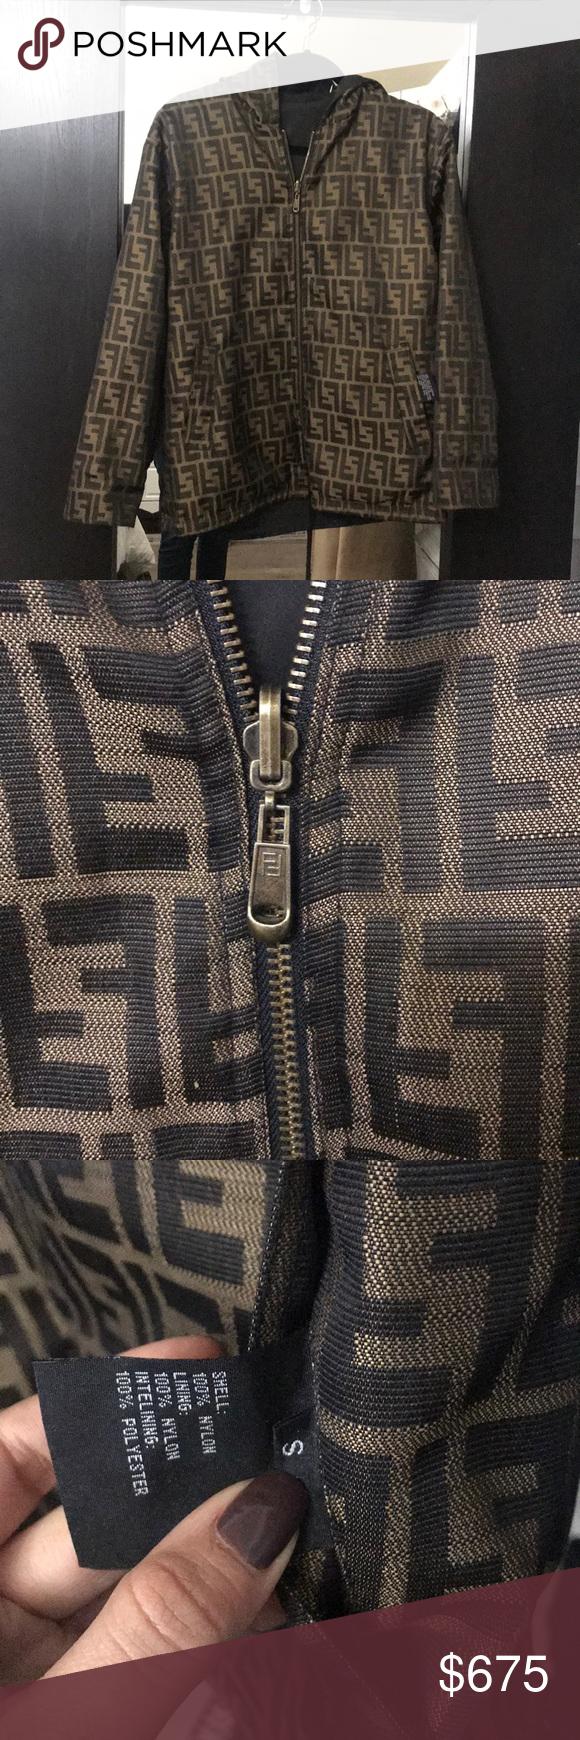 Vintage Fendi Zucca Monogram Jacket Monogram Jacket Clothes Design Reversible Jackets